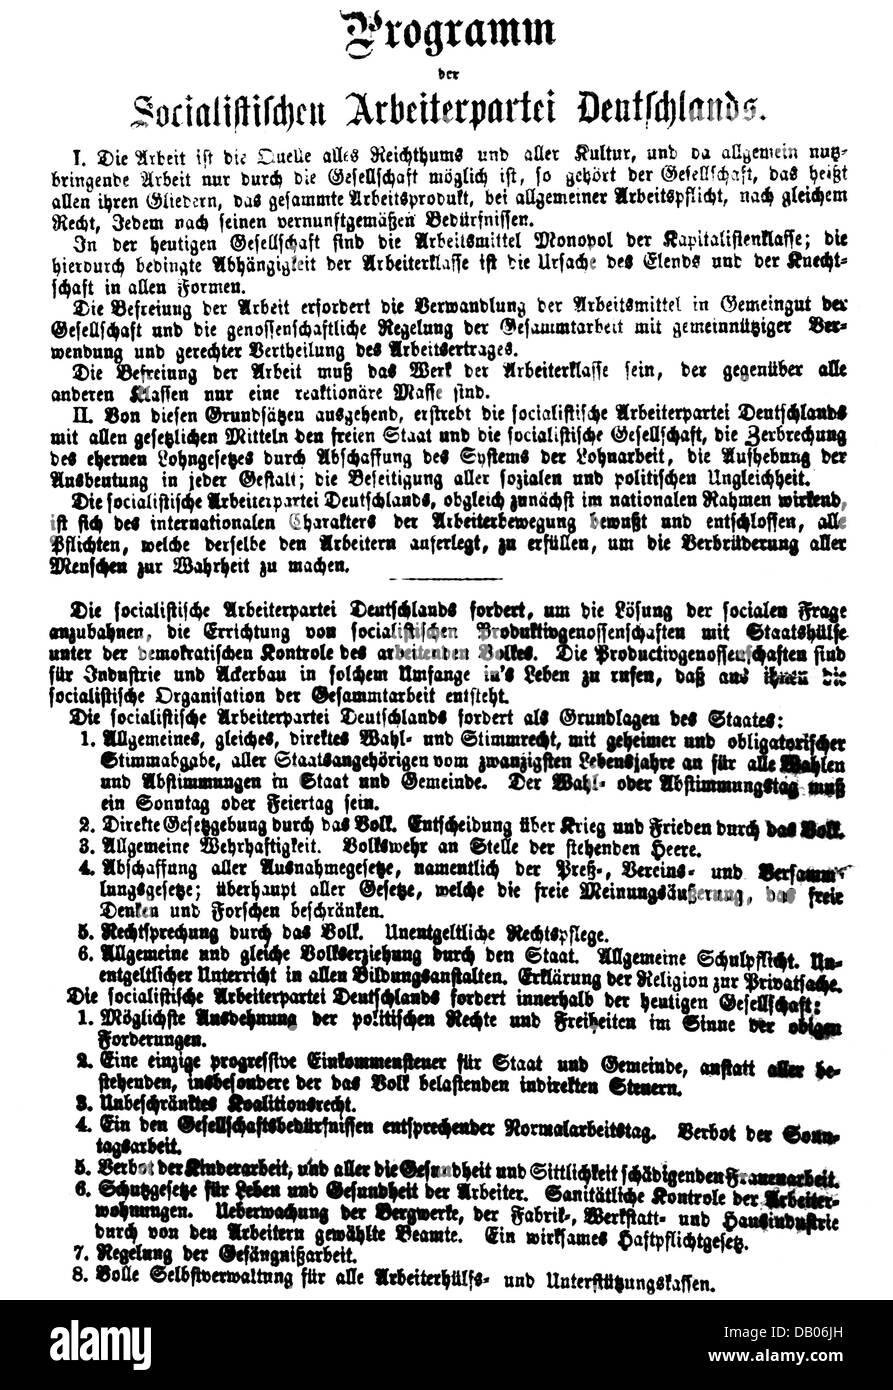 politics, Germany, parties, social democrats, unification congress of the Social-Democratic Labour Party (Sozialdemokratische - Stock Image